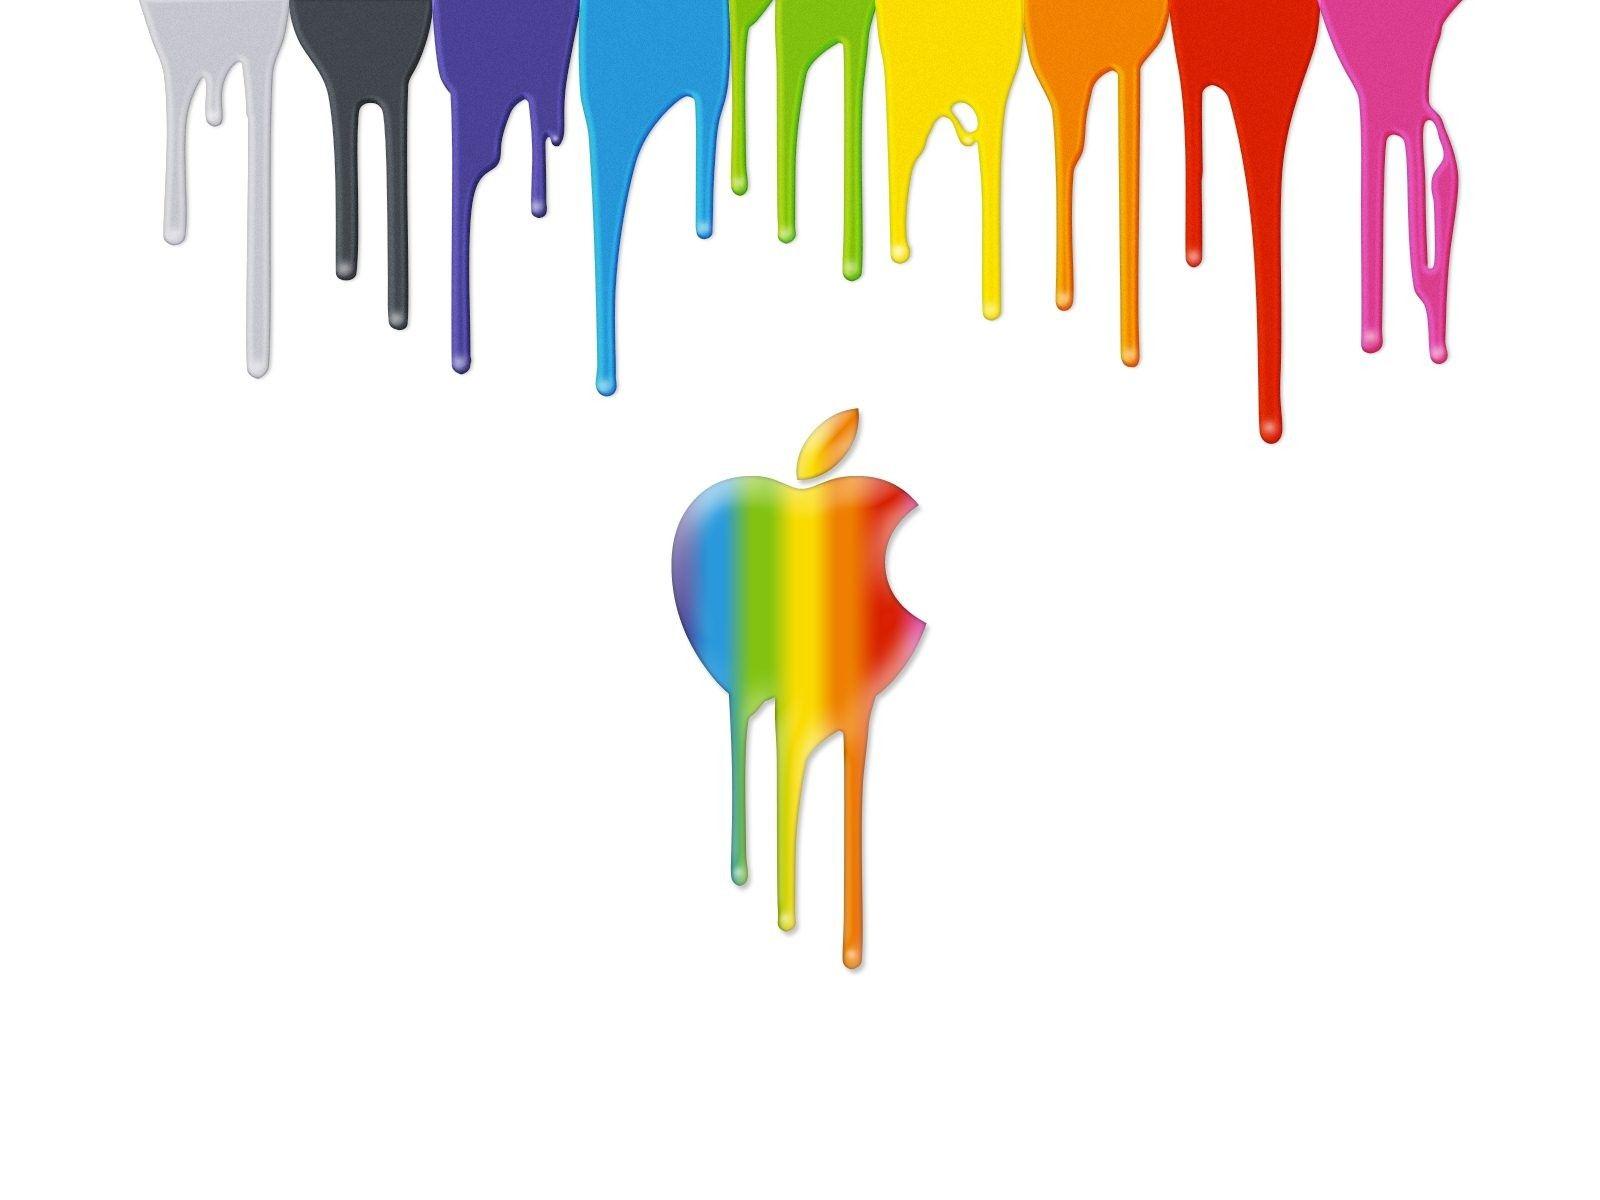 funny apple wallpaper 1600x1200px | 106.68 kb ratio: 4:3. funny